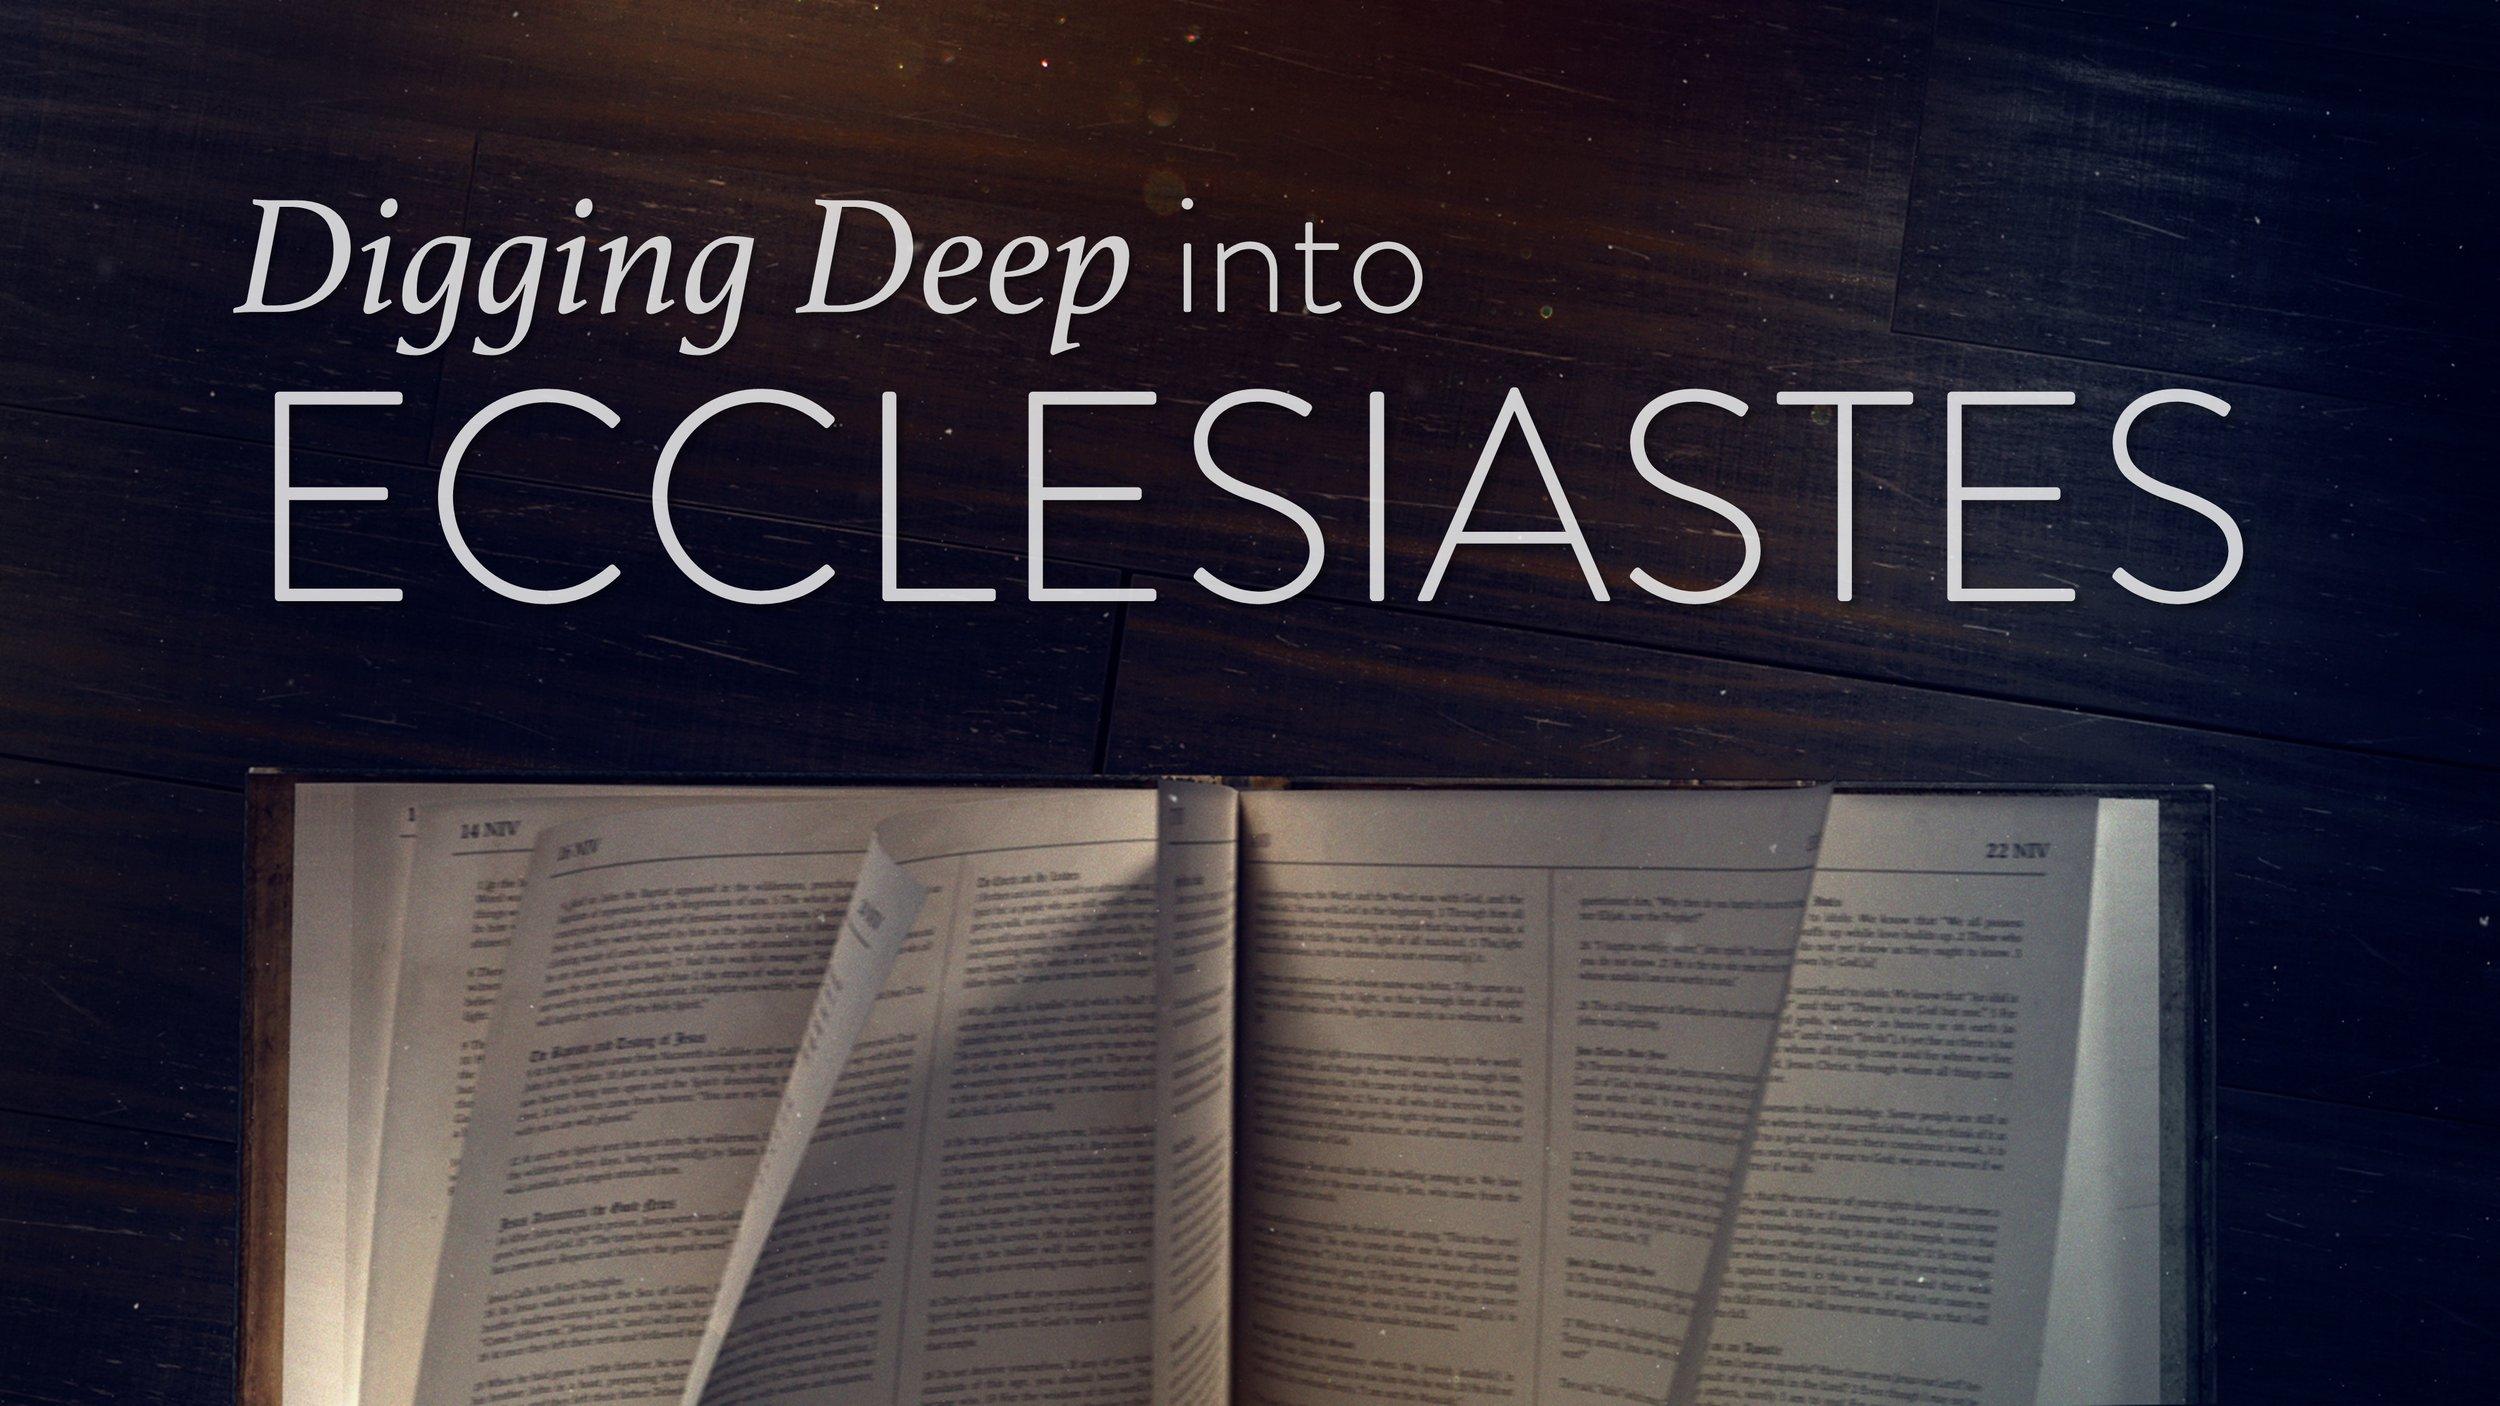 Digging Deep (Ecclesiastes).jpg